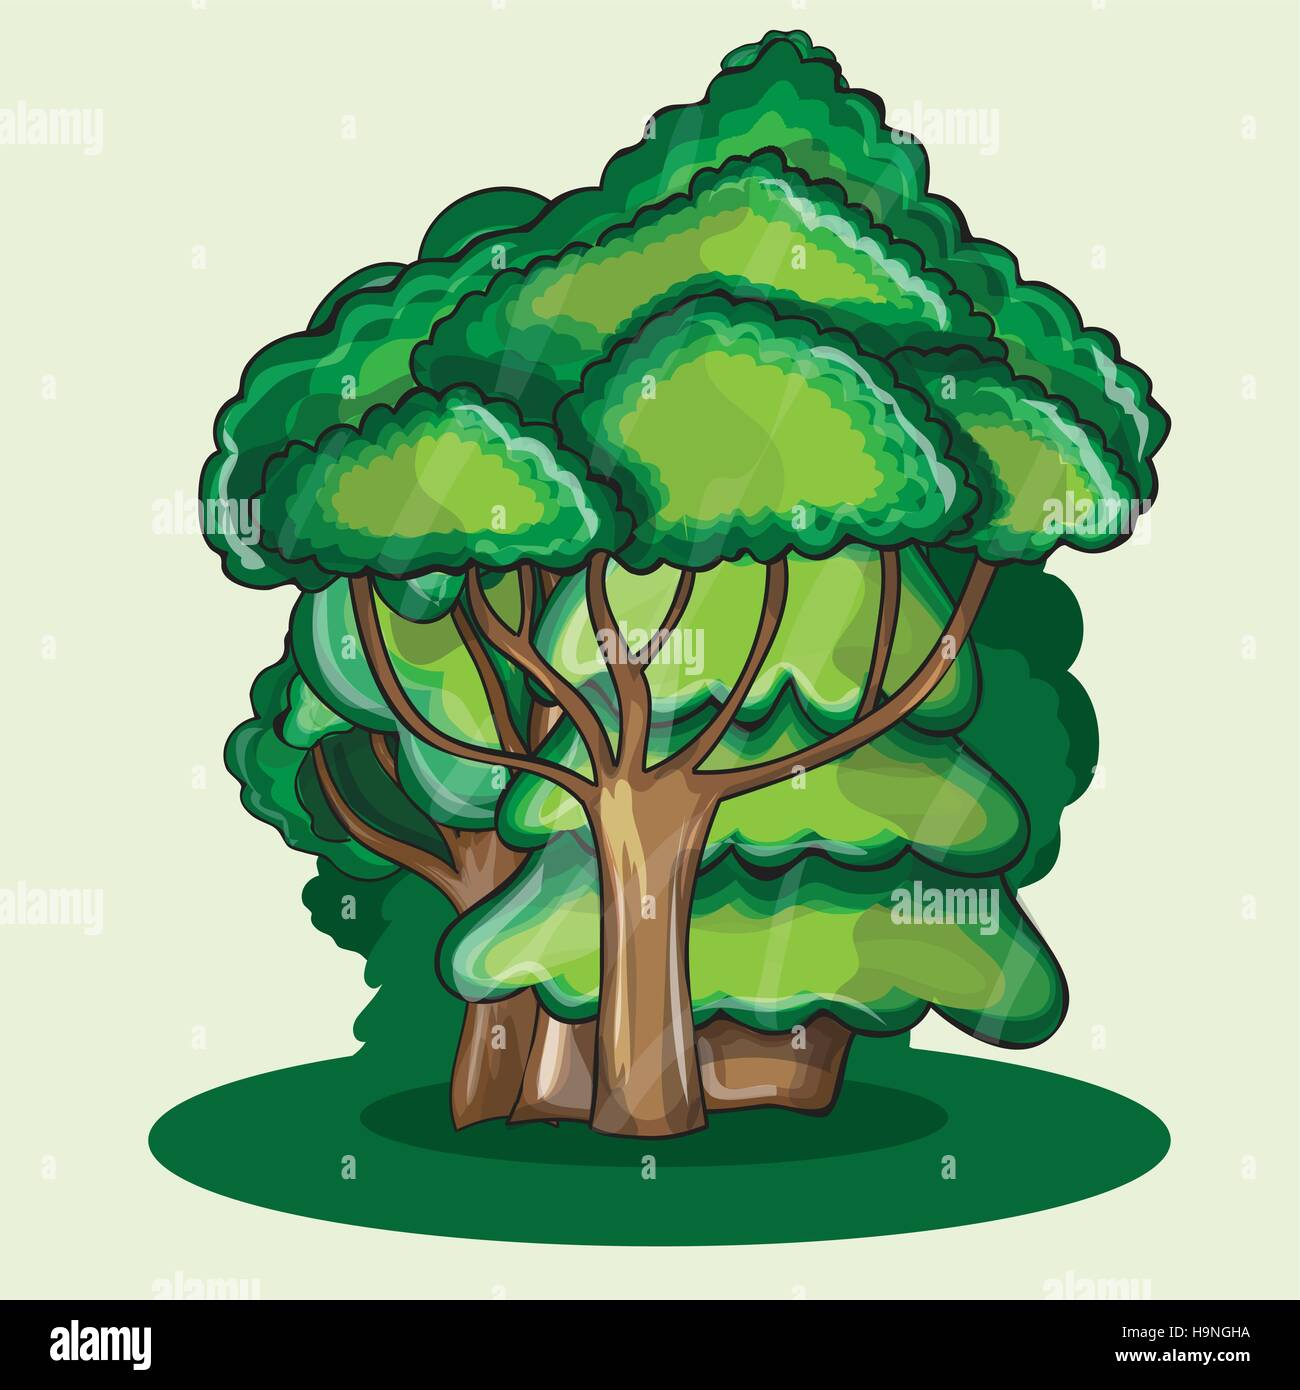 Wood against a cloud  - cartoon vector illustration - Stock Image